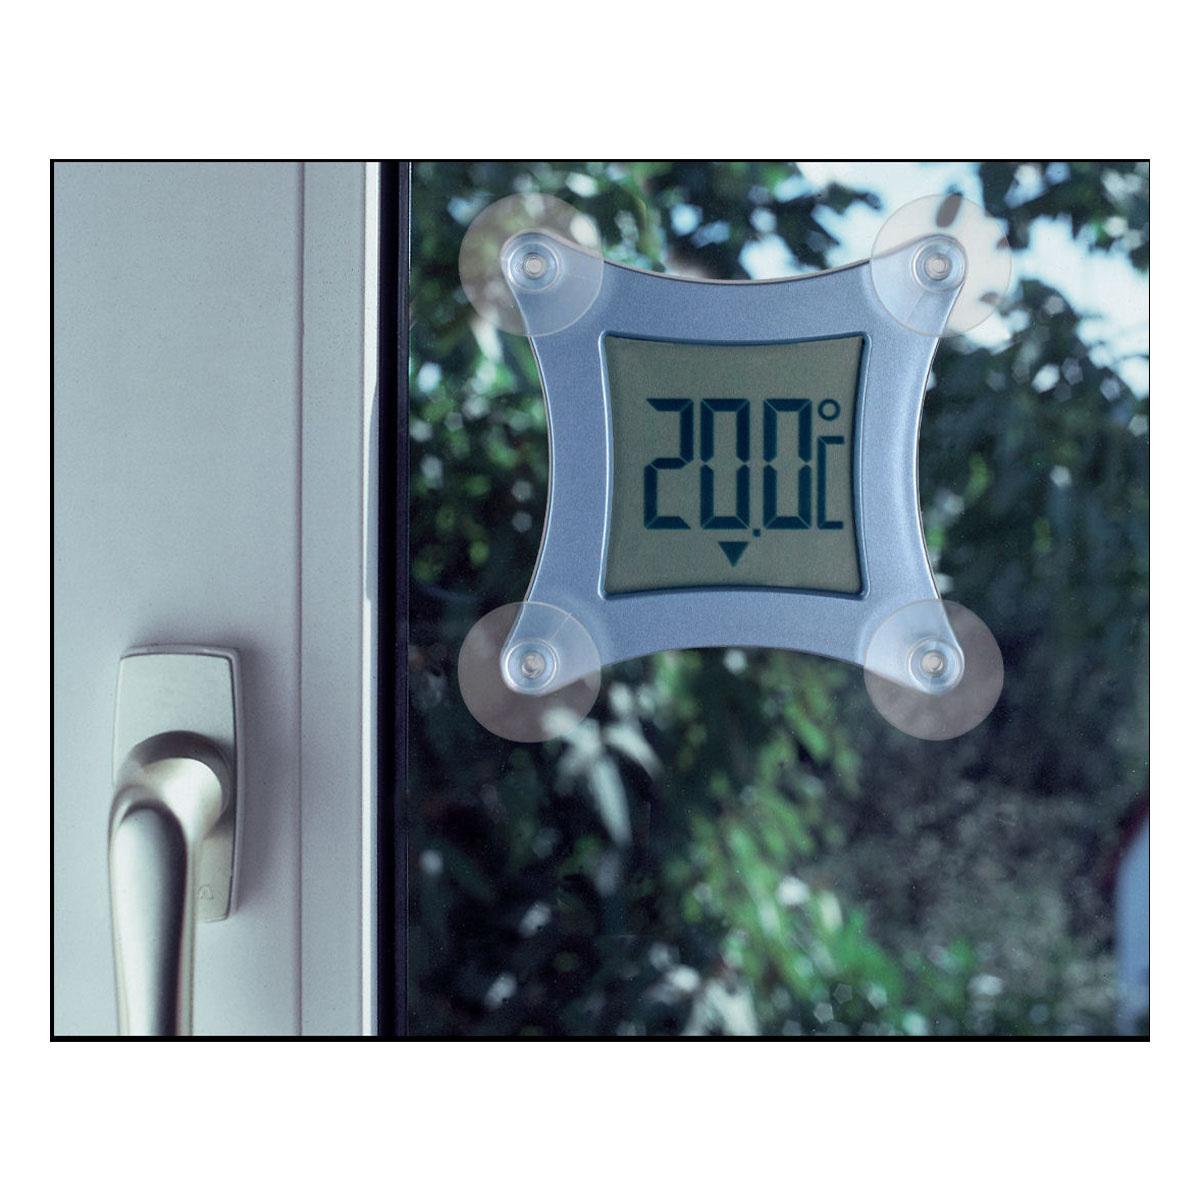 30-1026-digitales-fensterthermometer-pocco-anwendung-1200x1200px.jpg